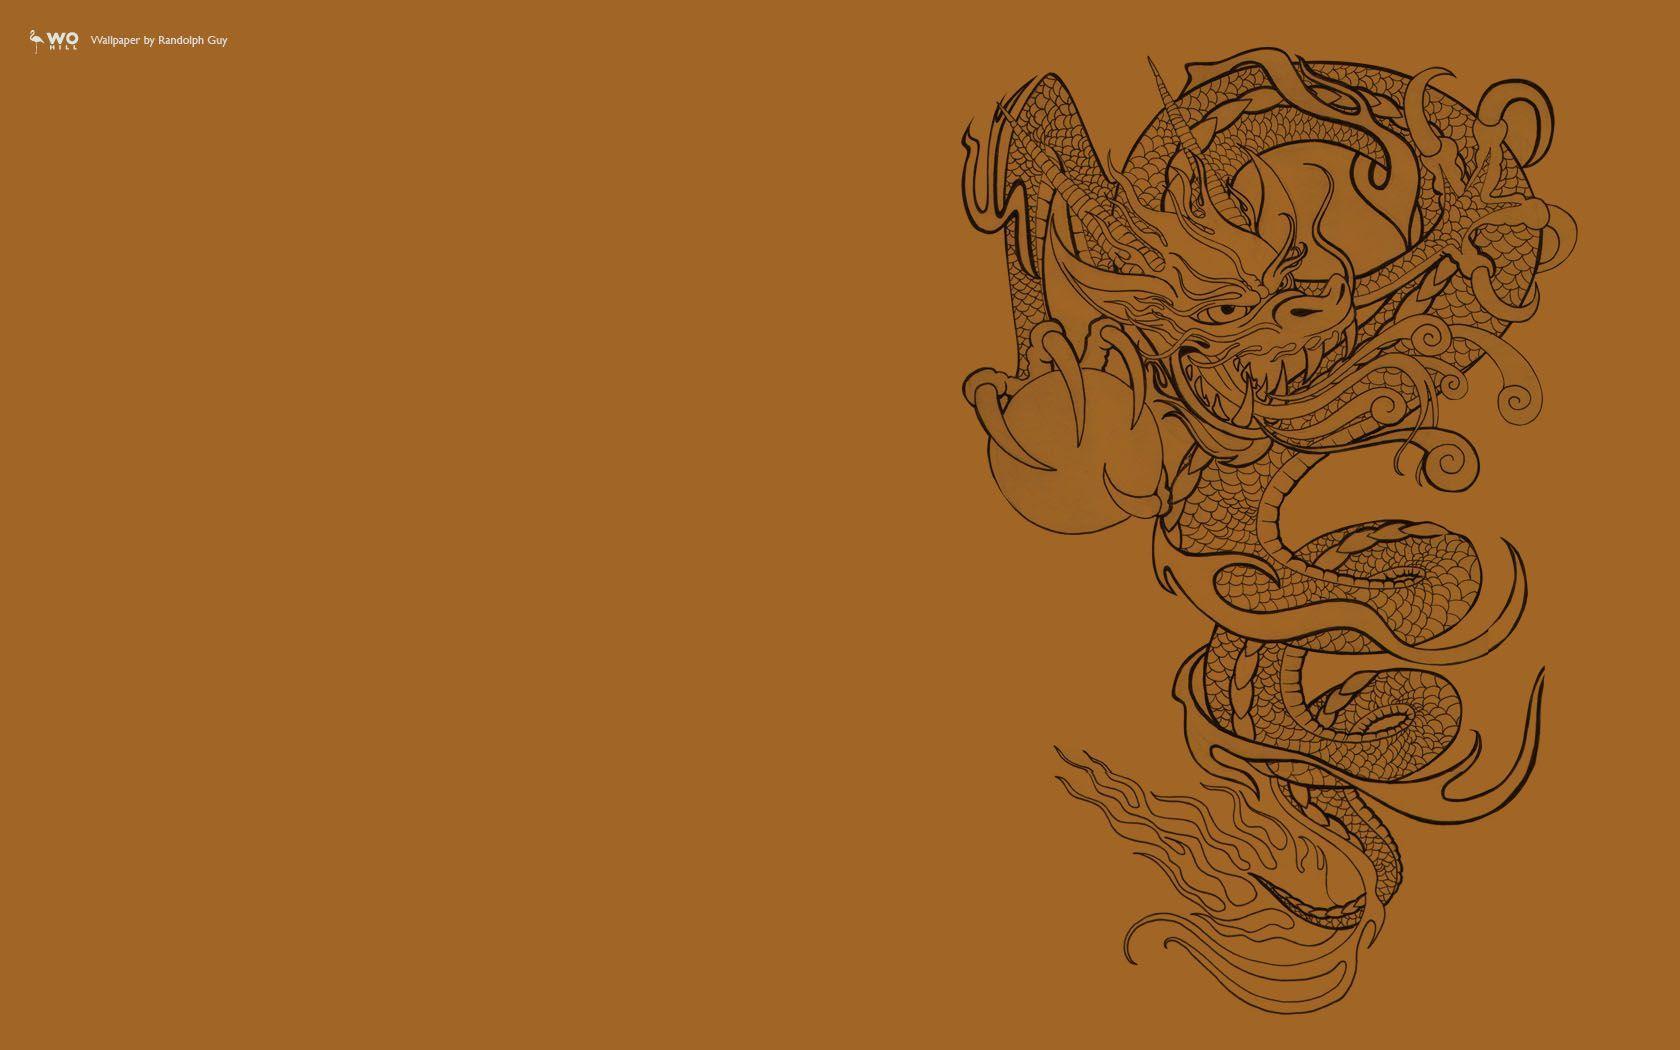 Yakuza Dragon Wallpapers Top Free Yakuza Dragon Backgrounds Wallpaperaccess